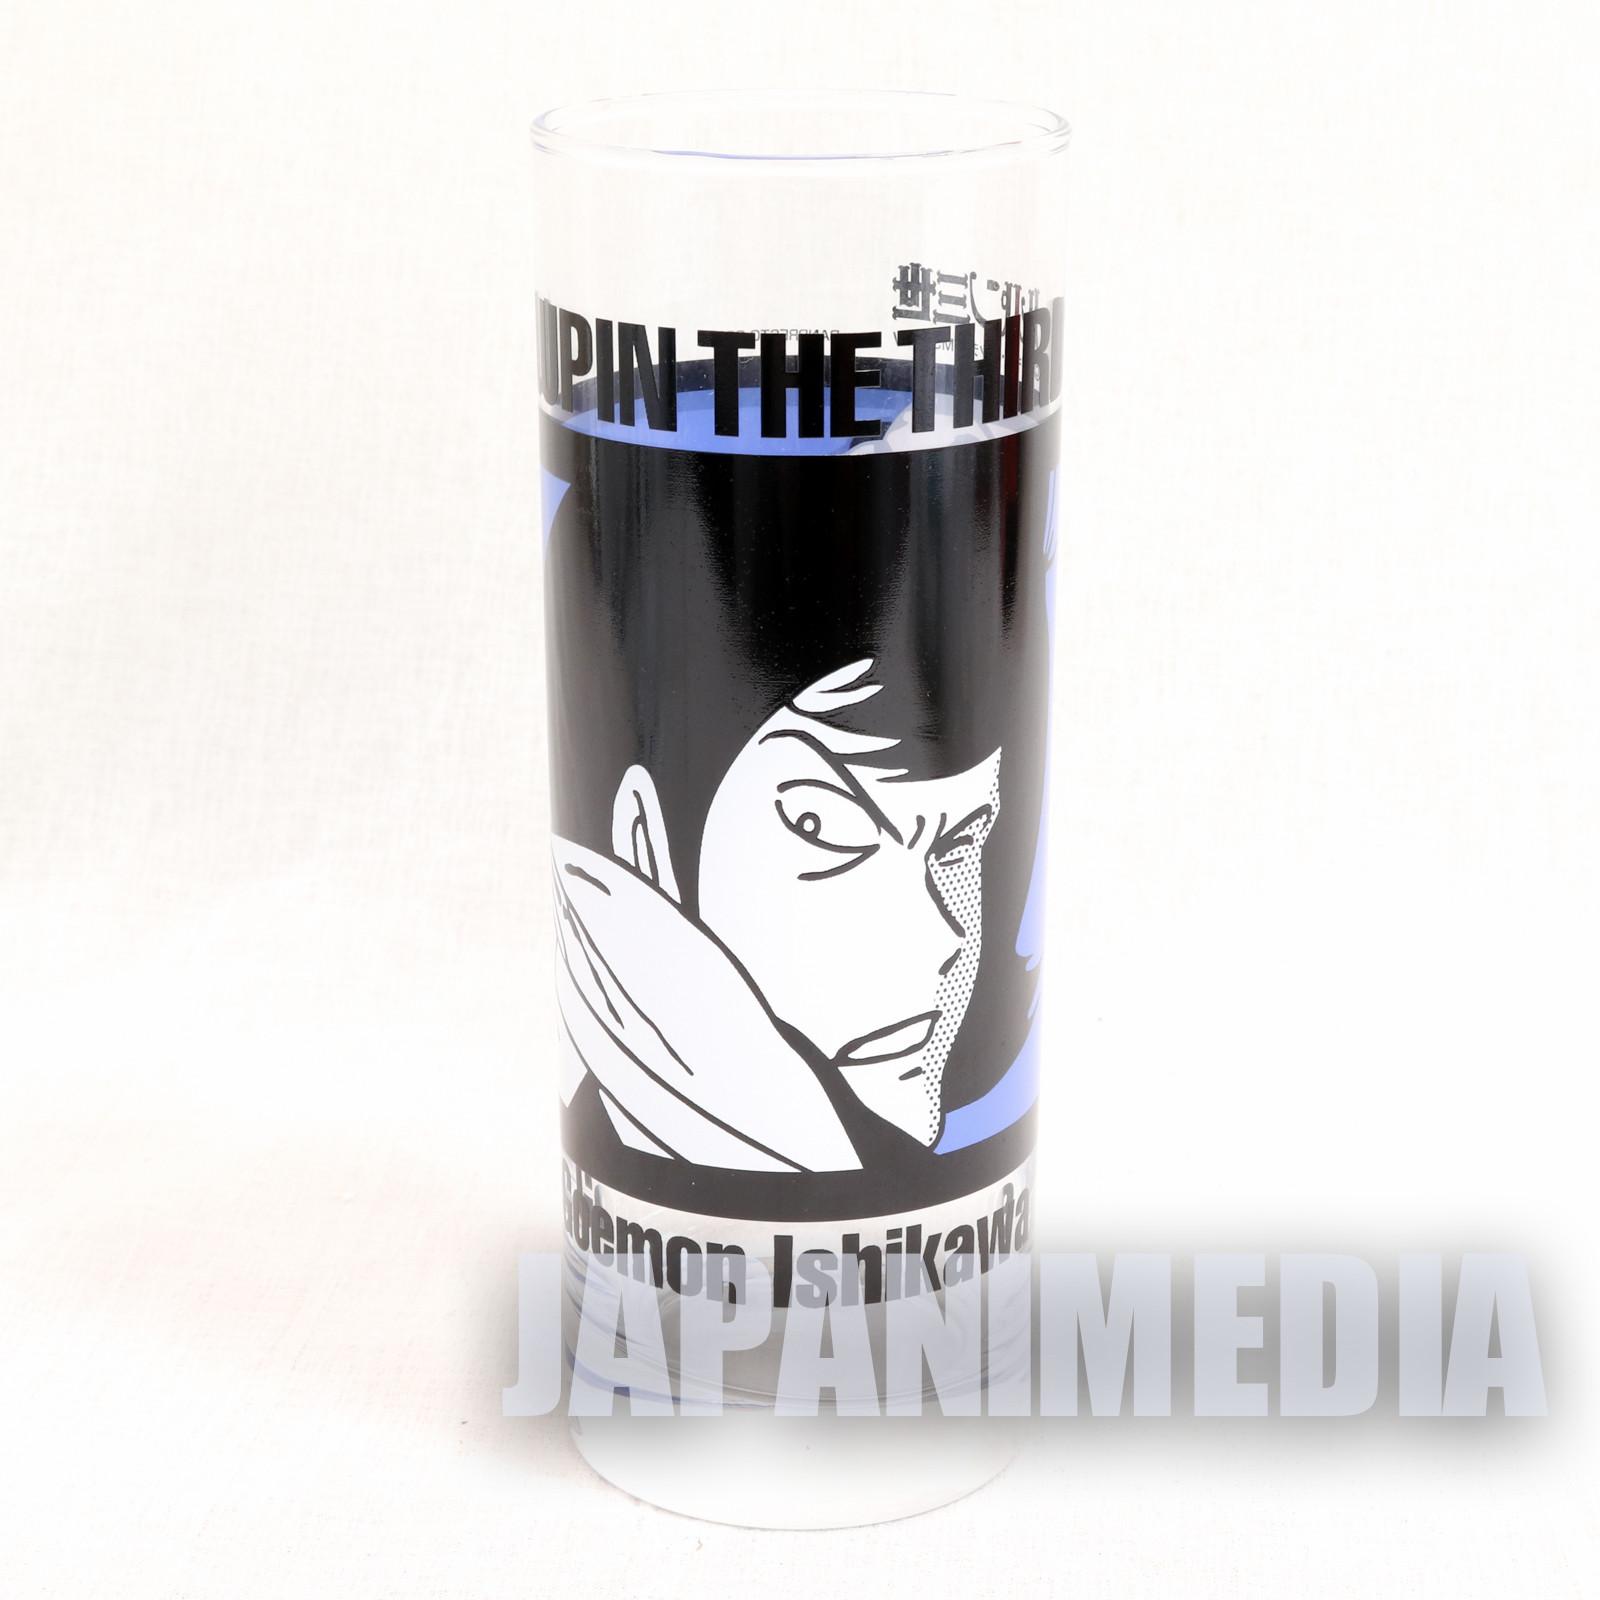 Lupin the Third (3rd) Stylish Glass Goemon Ver. Banpresto JAPAN ANIME MANGA 2